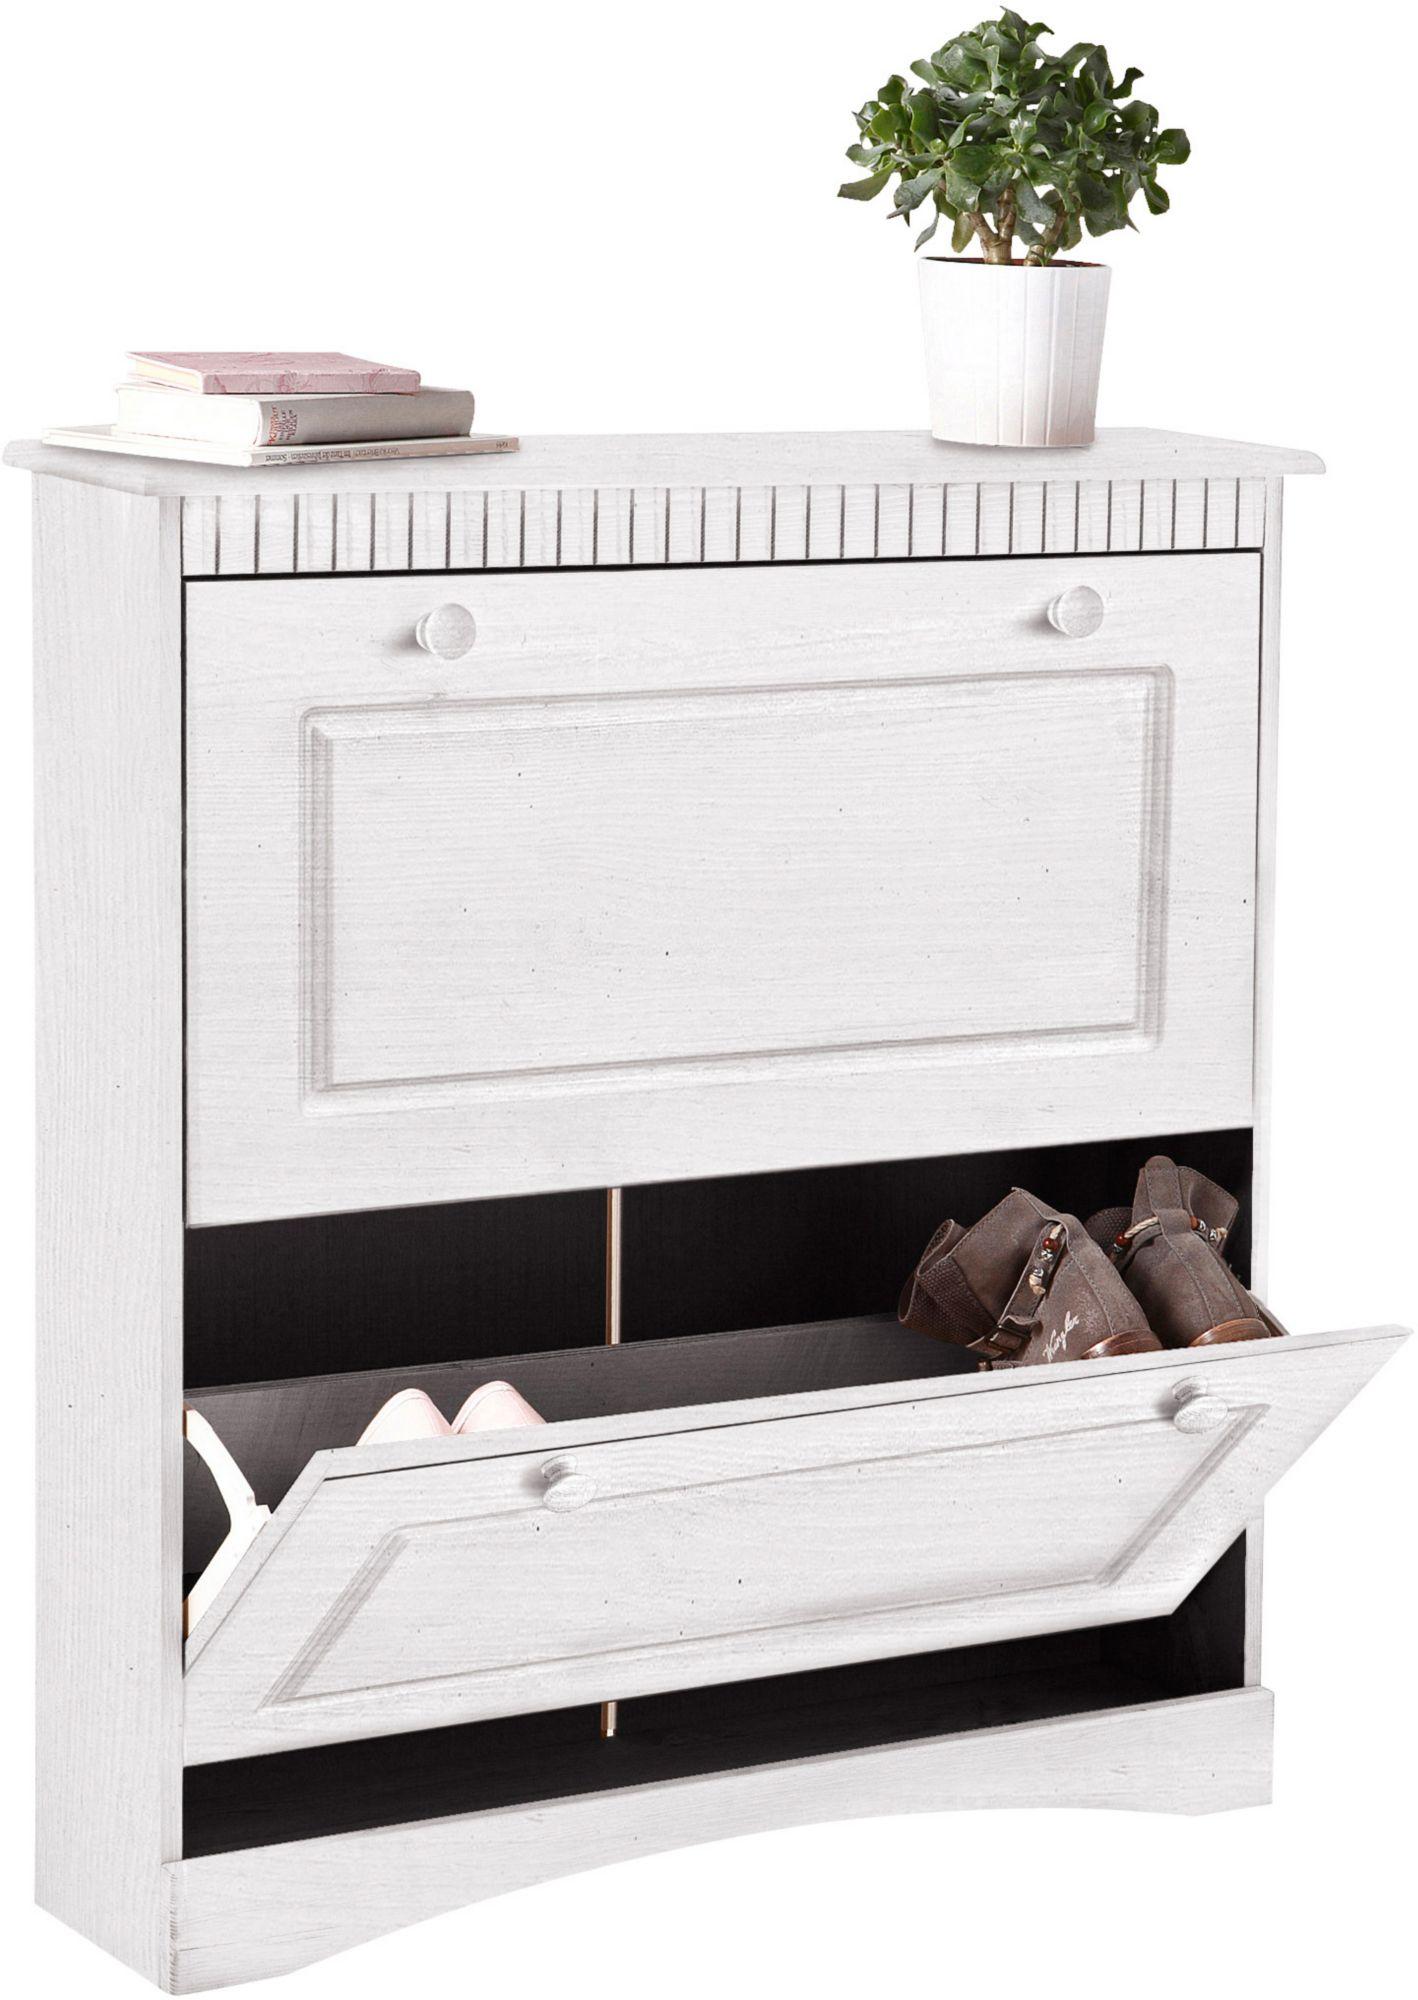 schuhschrank home affaire rustic schwab versand b nke truhen. Black Bedroom Furniture Sets. Home Design Ideas